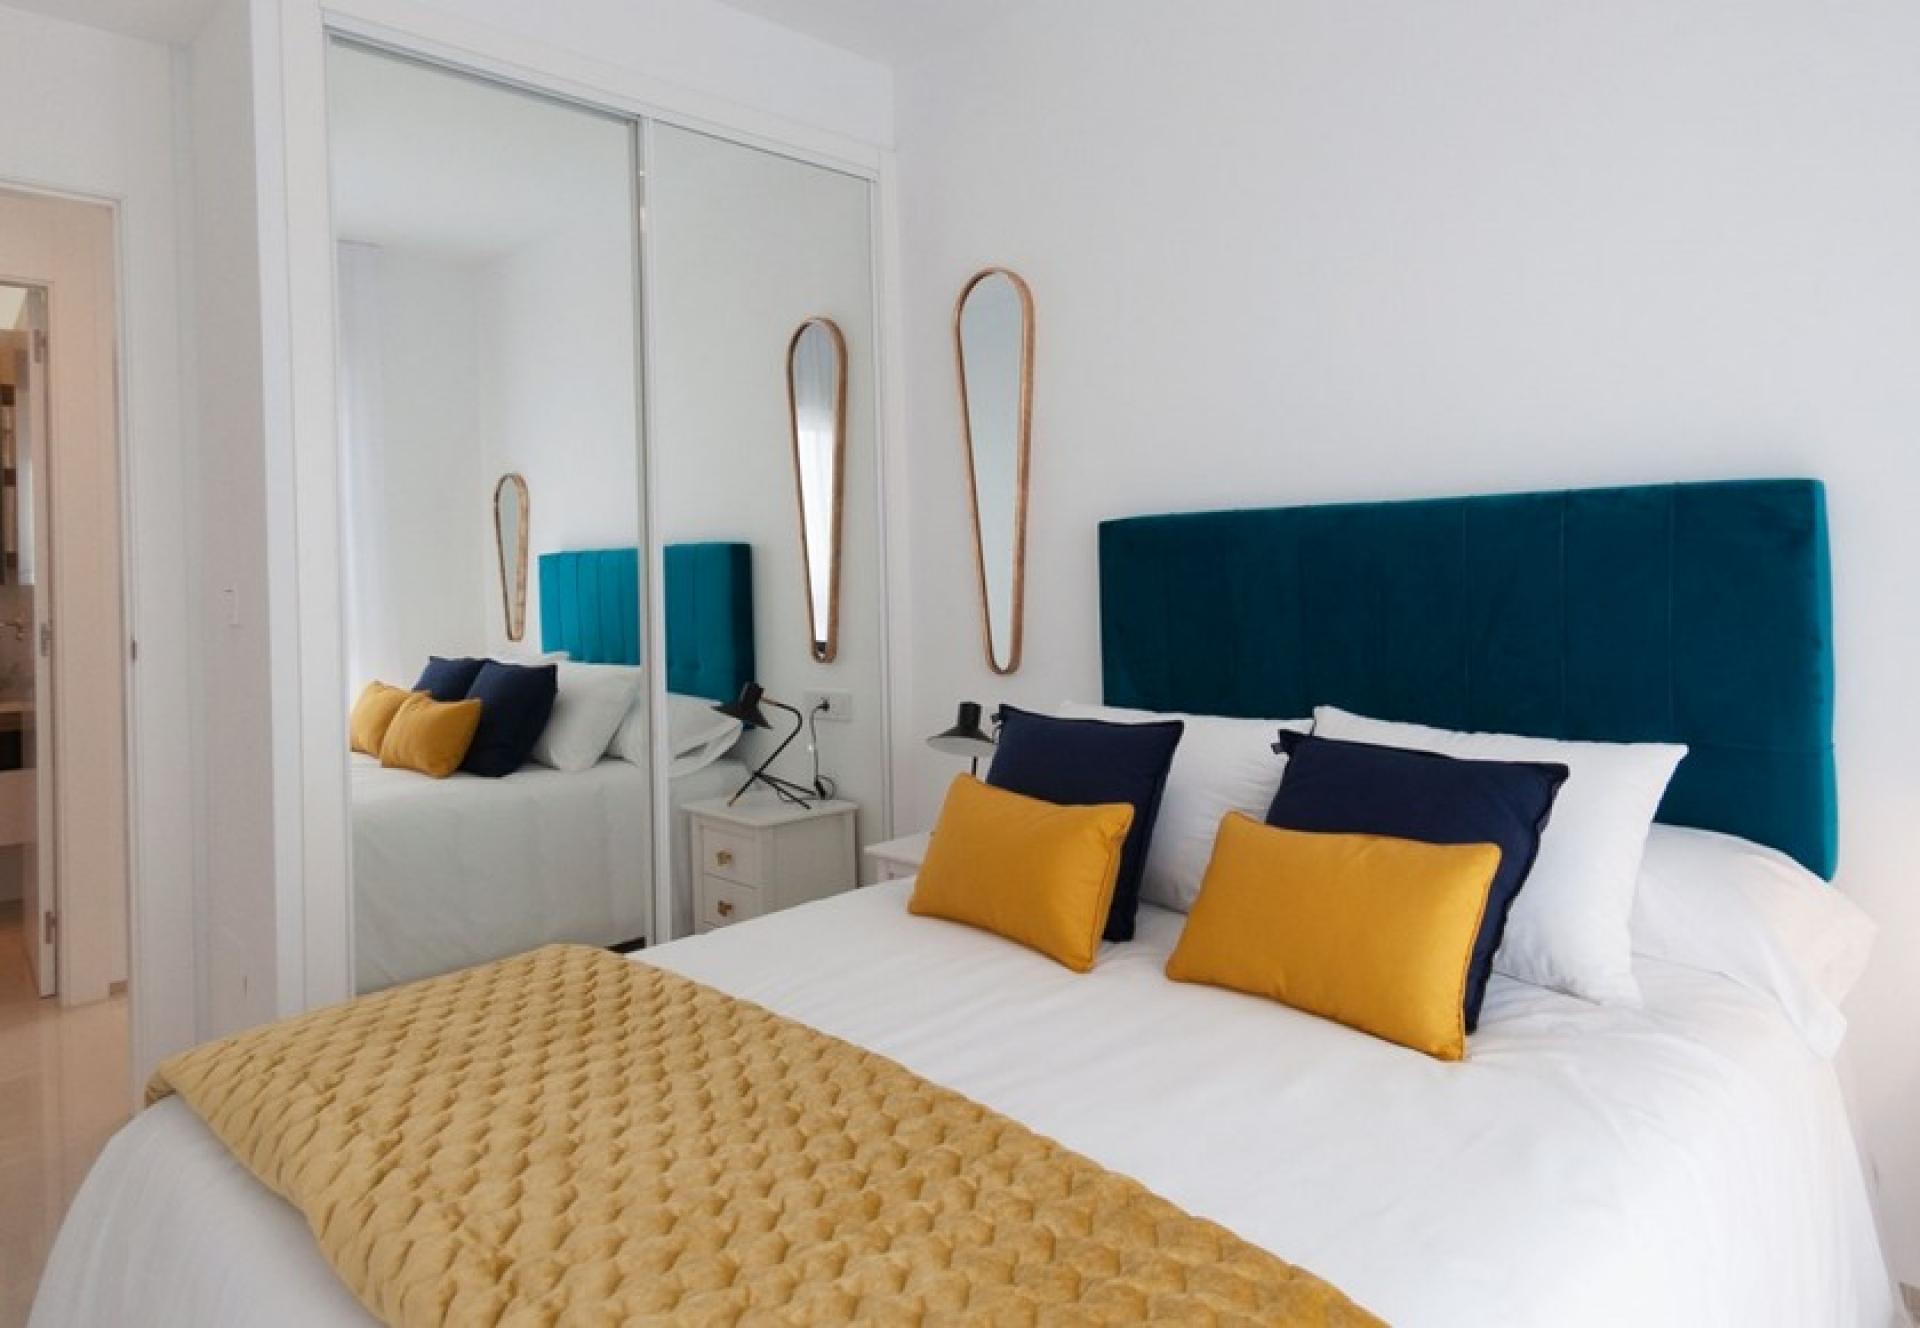 Gelijkvloers appartement Dona Pepa, Ciudad Quesada in Medvilla Spanje